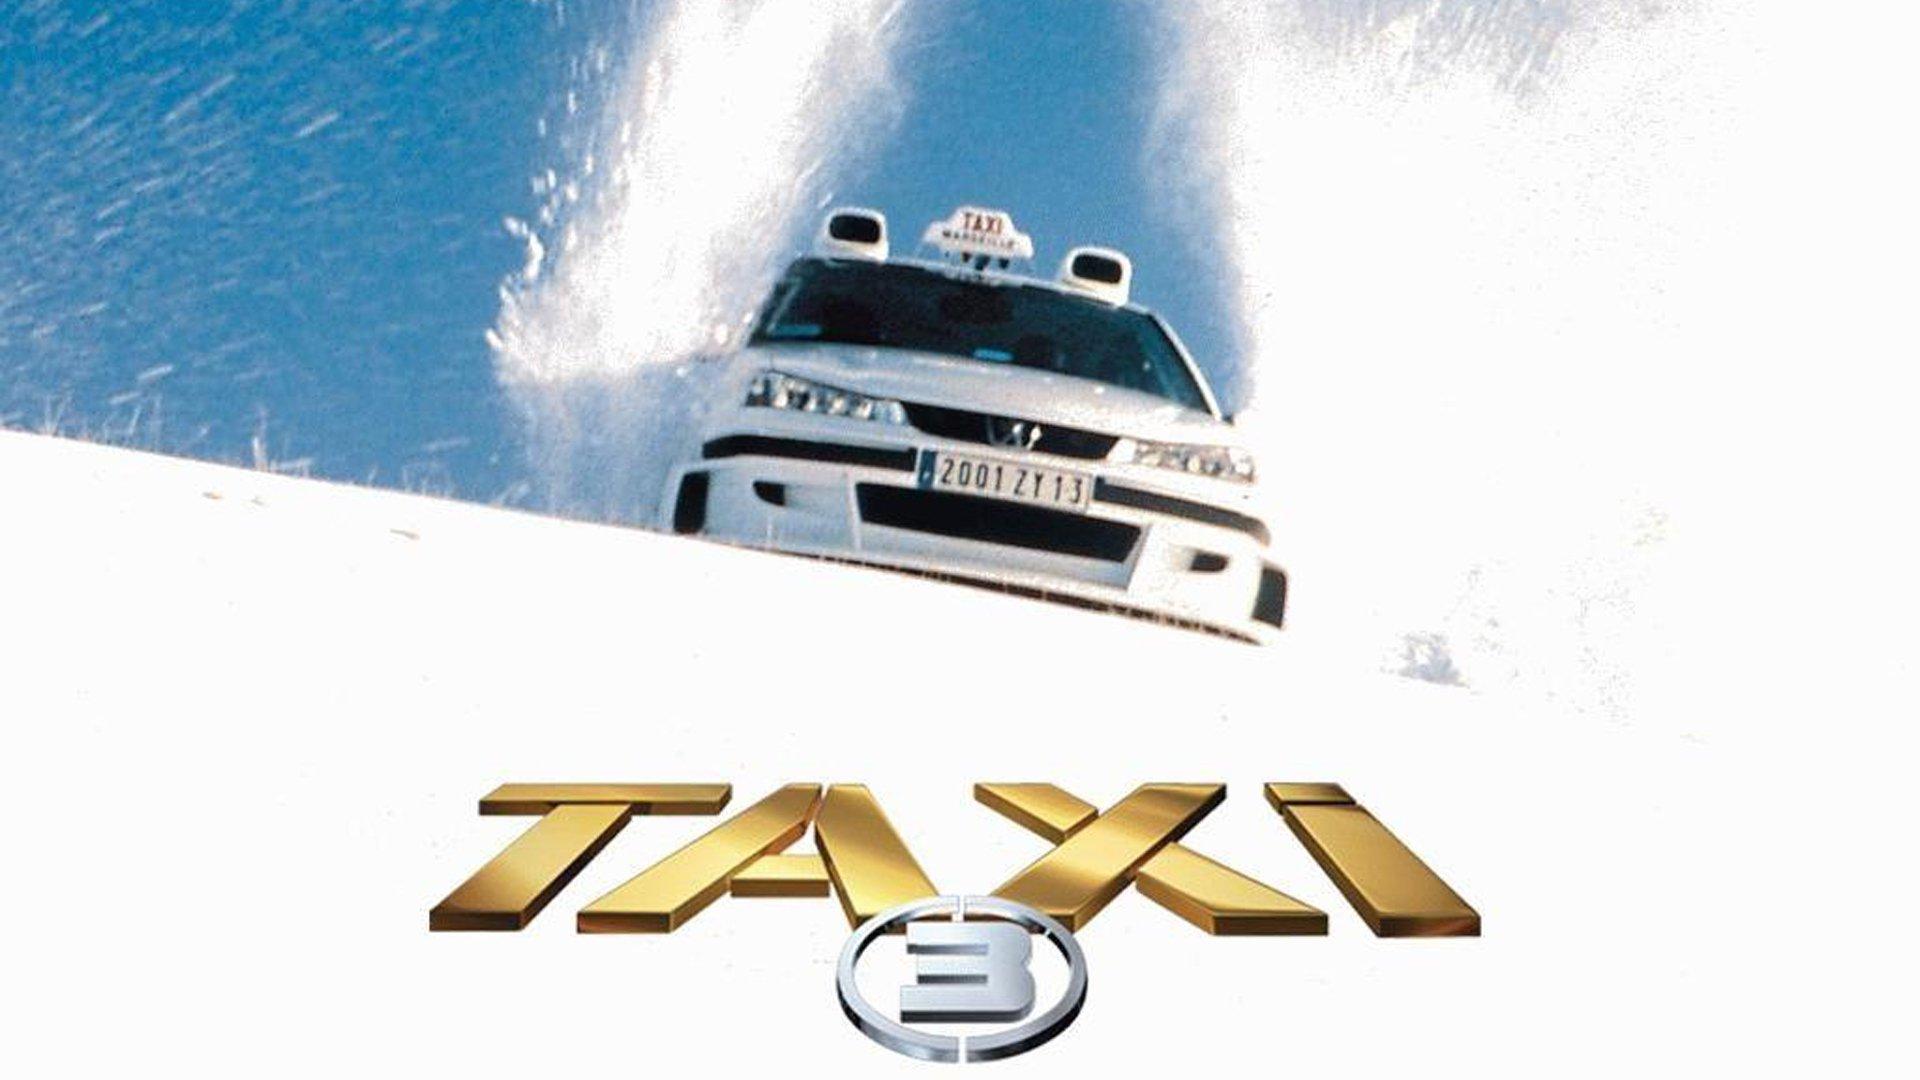 taxi 3 film 1h 30min 2003 cin s ries. Black Bedroom Furniture Sets. Home Design Ideas